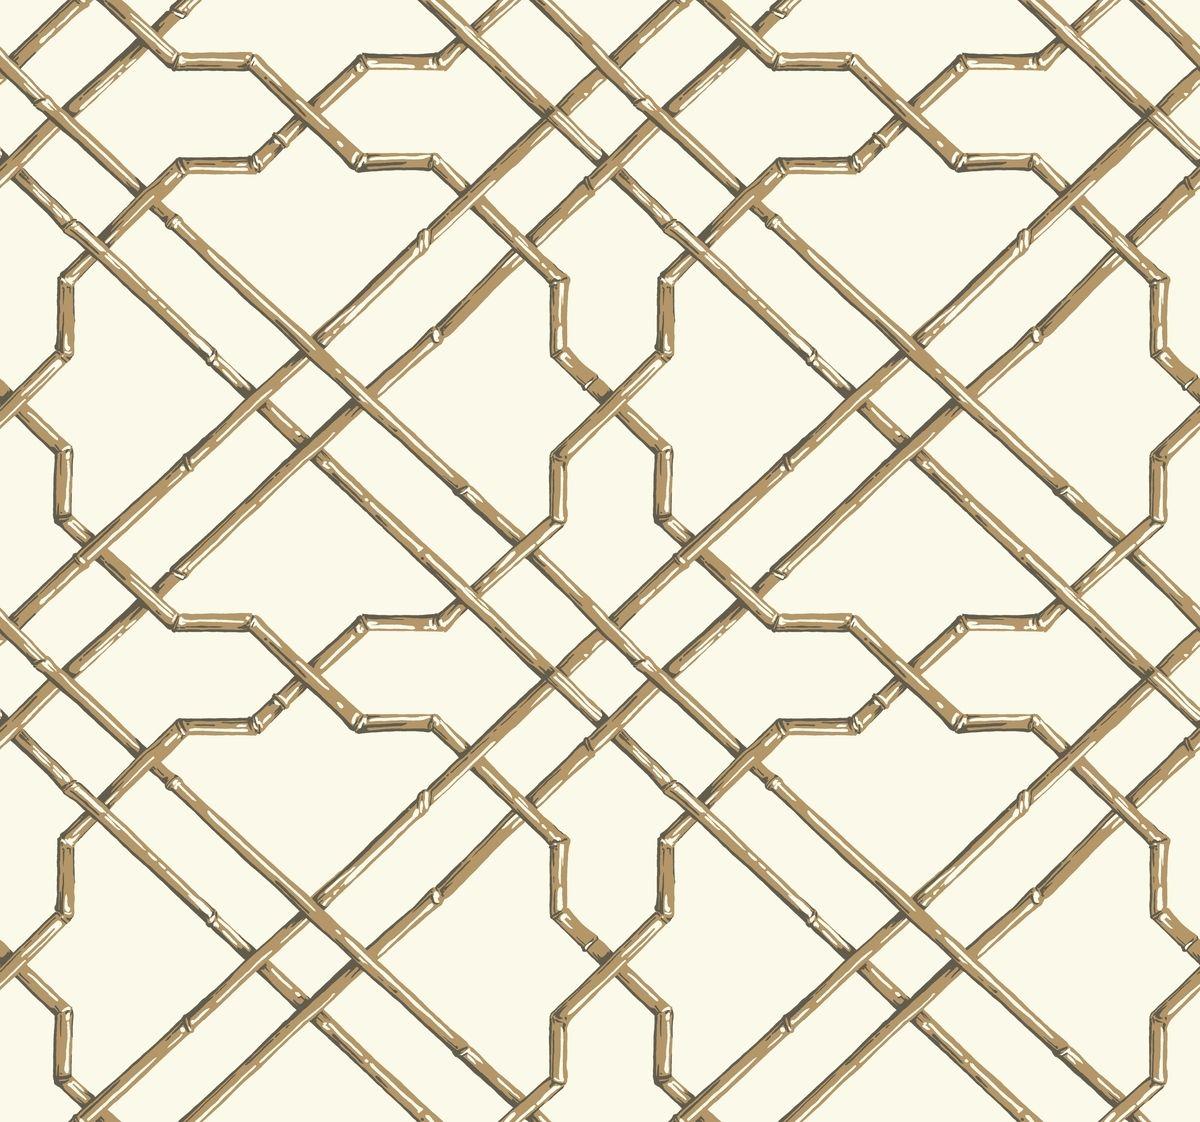 York At7074 Tropics Bamboo Trellis Wallpaper White Tan